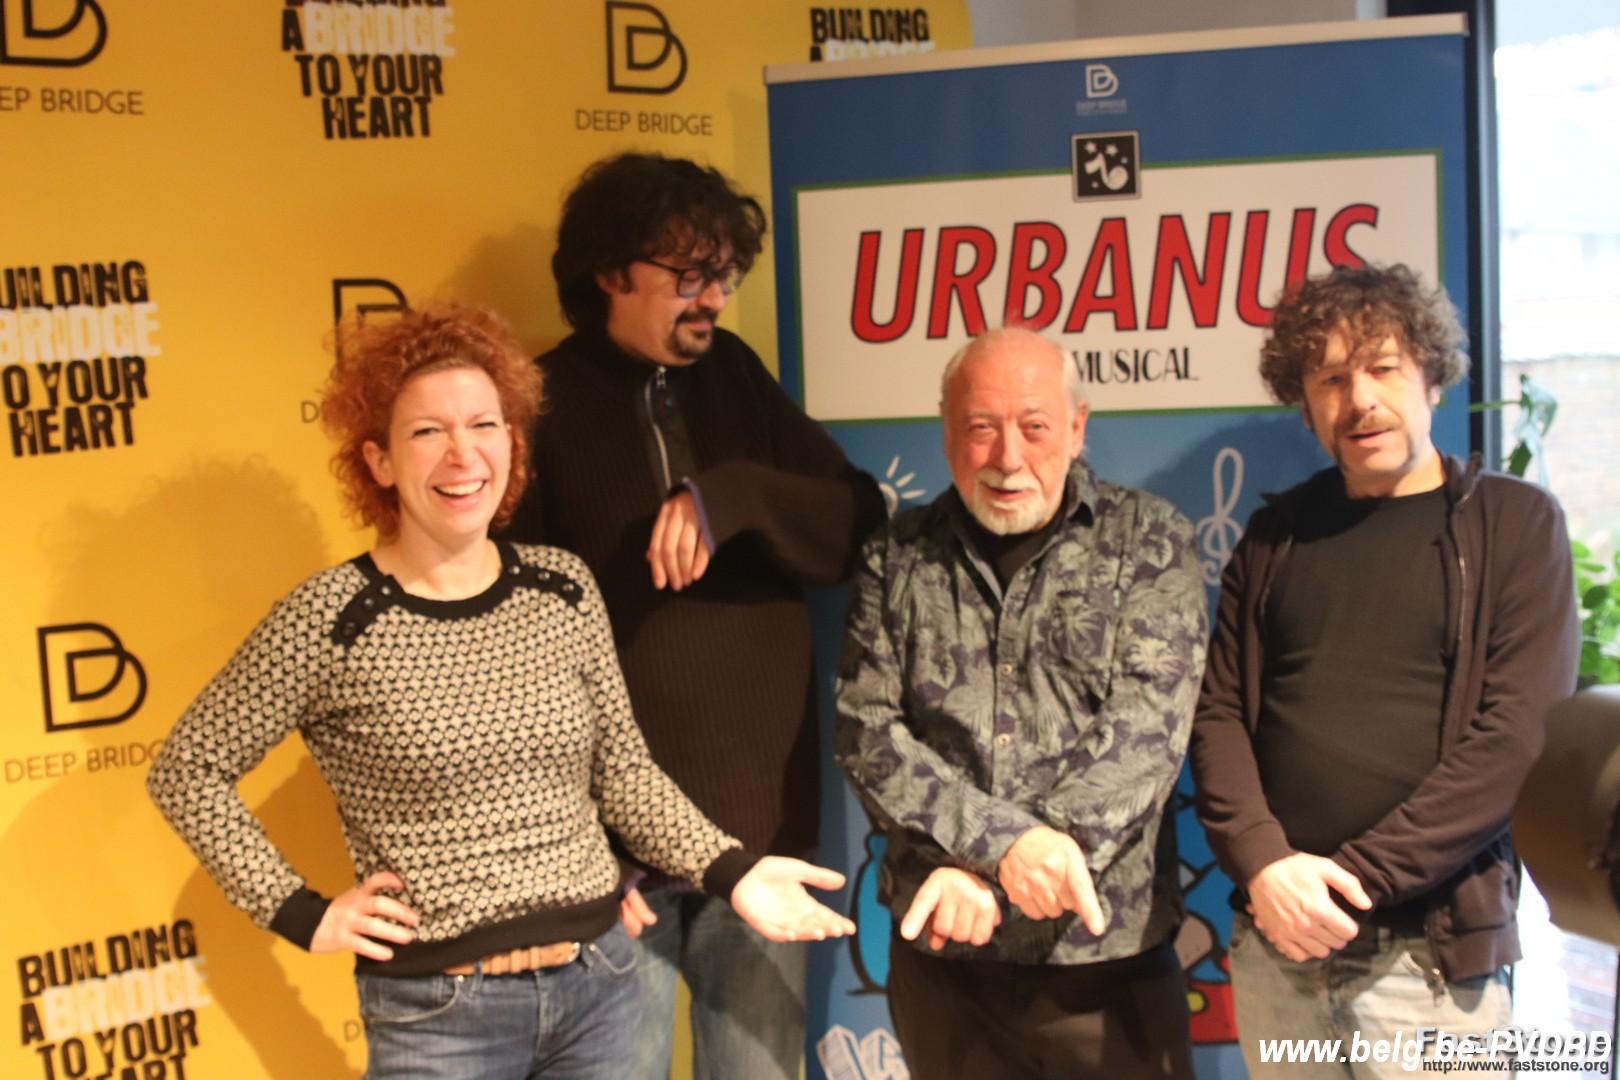 Cast Musical Urbanus is compleet - IMG 4003